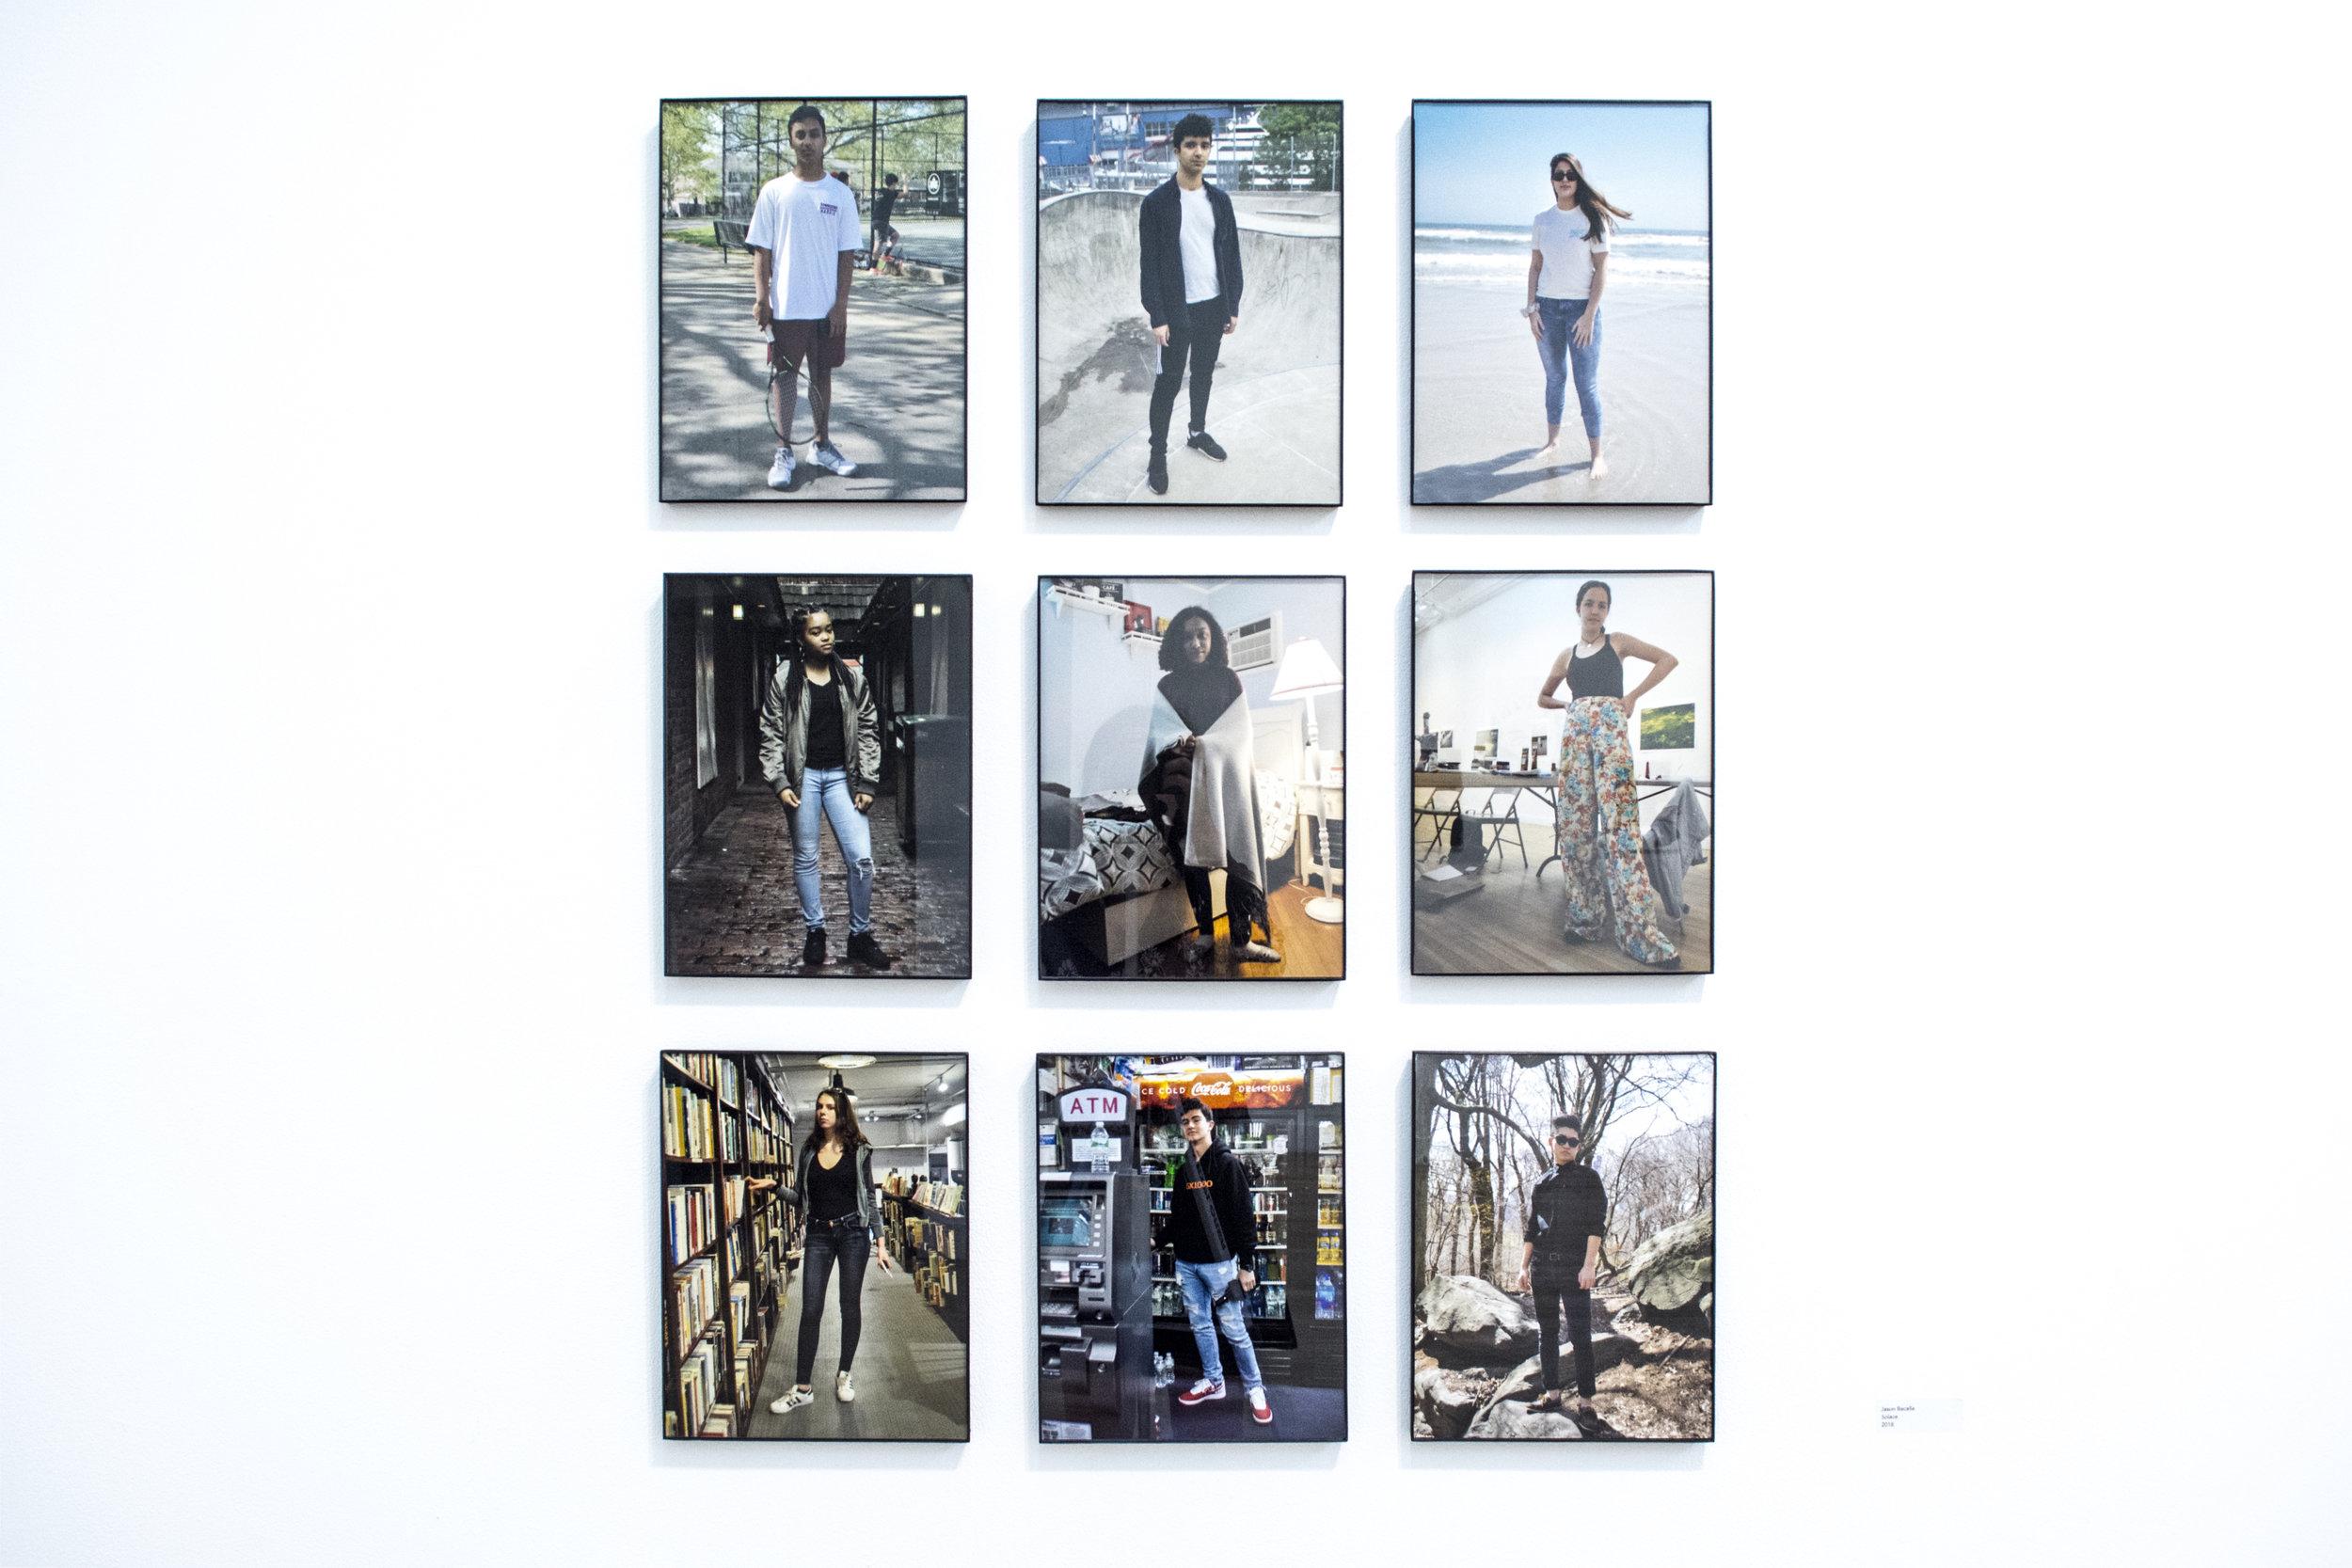 Jason Bacalla  Solace , 2018 Digital color photographs on Kodak Endura matte paper